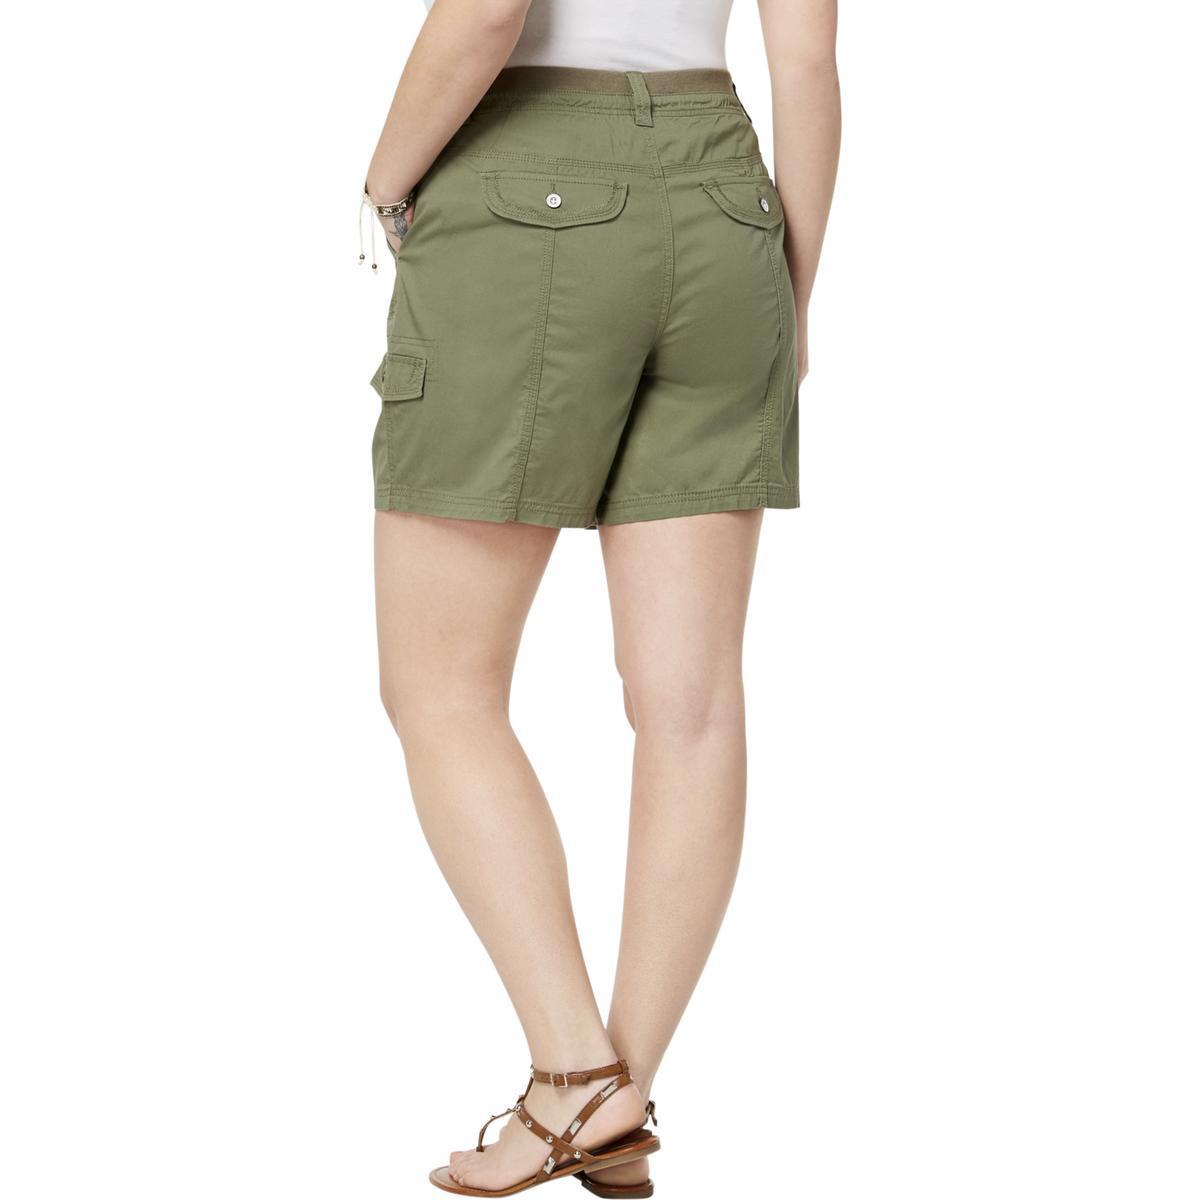 Style /& Co Womens Mid-Rise Comfort Waist Everyday Cargo Shorts Plus BHFO 9102